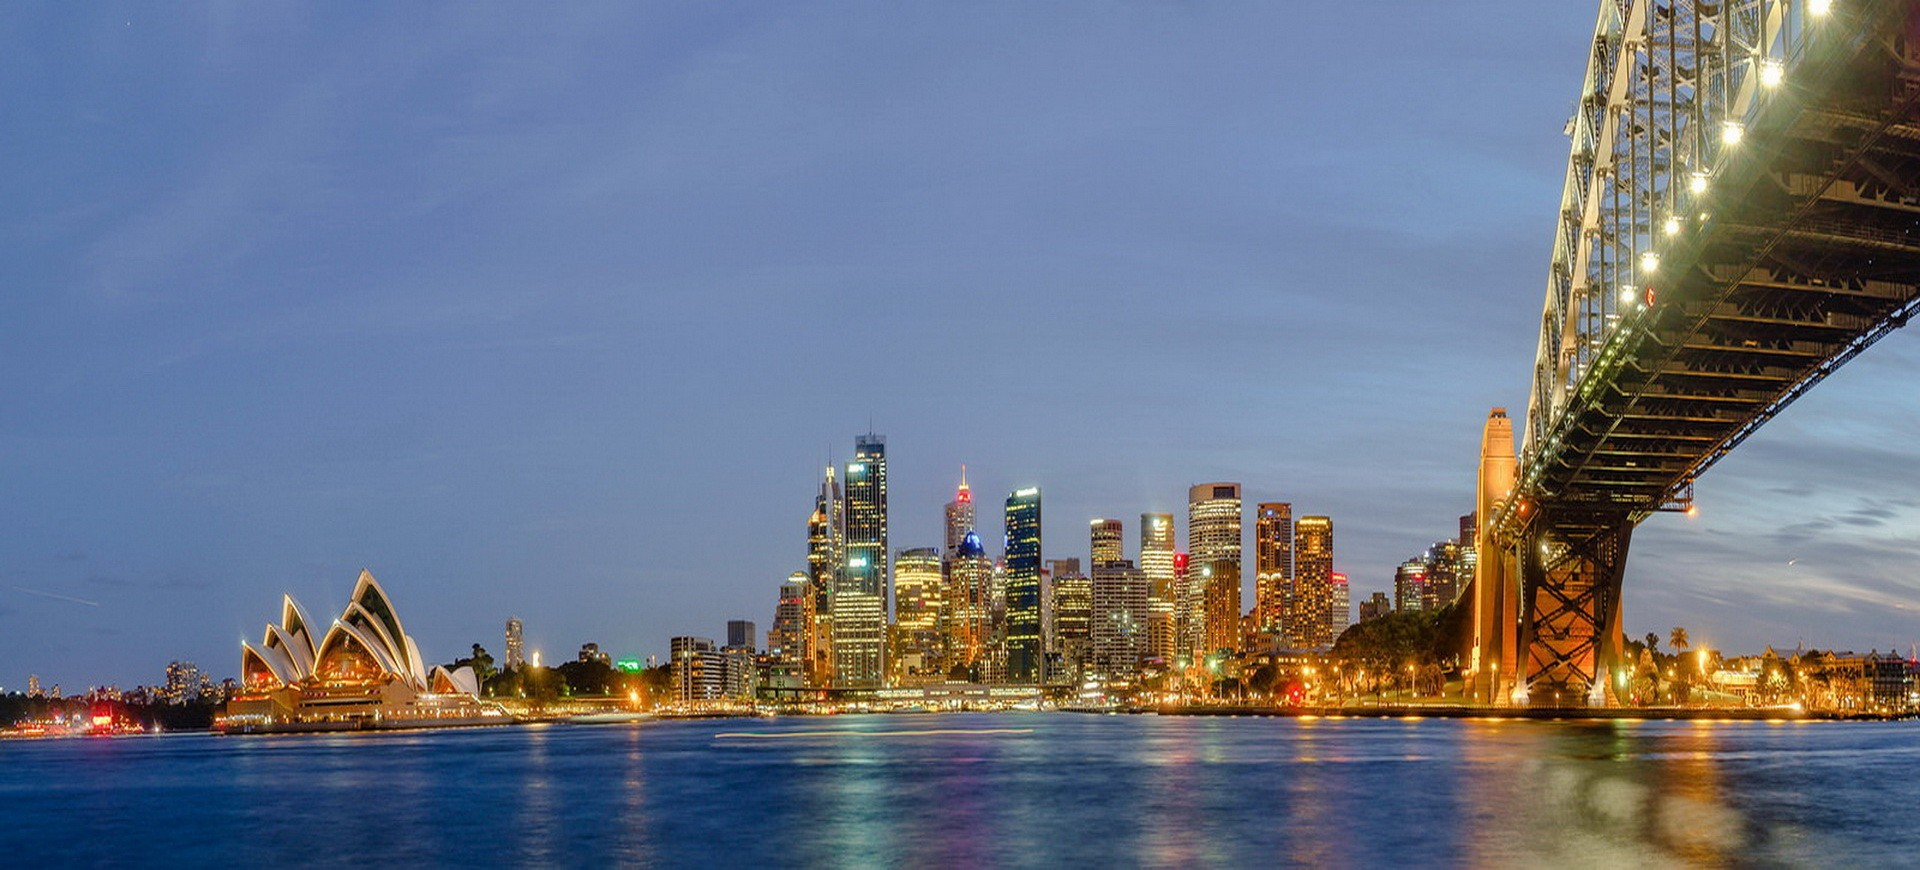 Australie Sydney by night